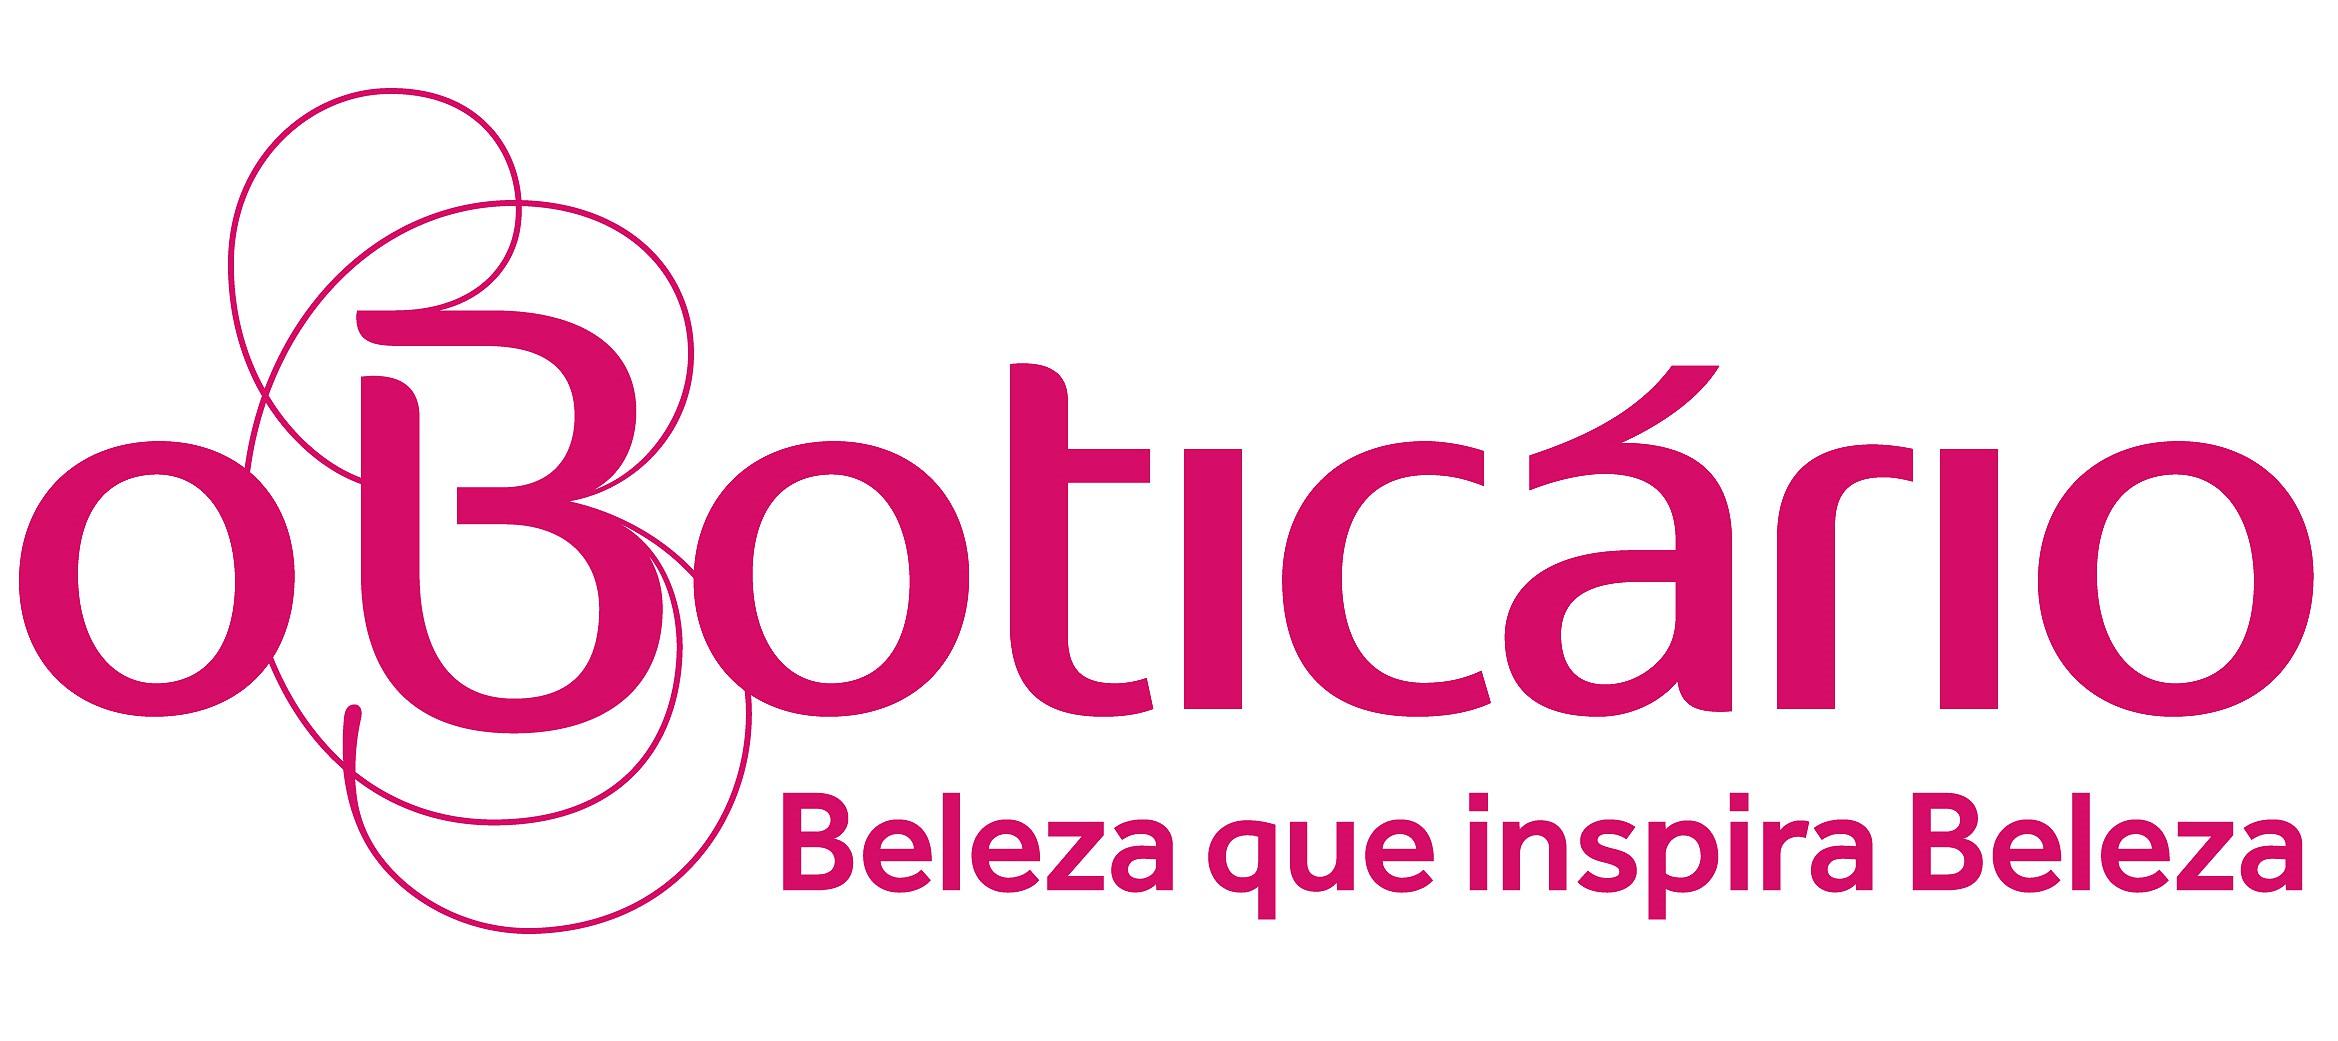 boticario_jg.png